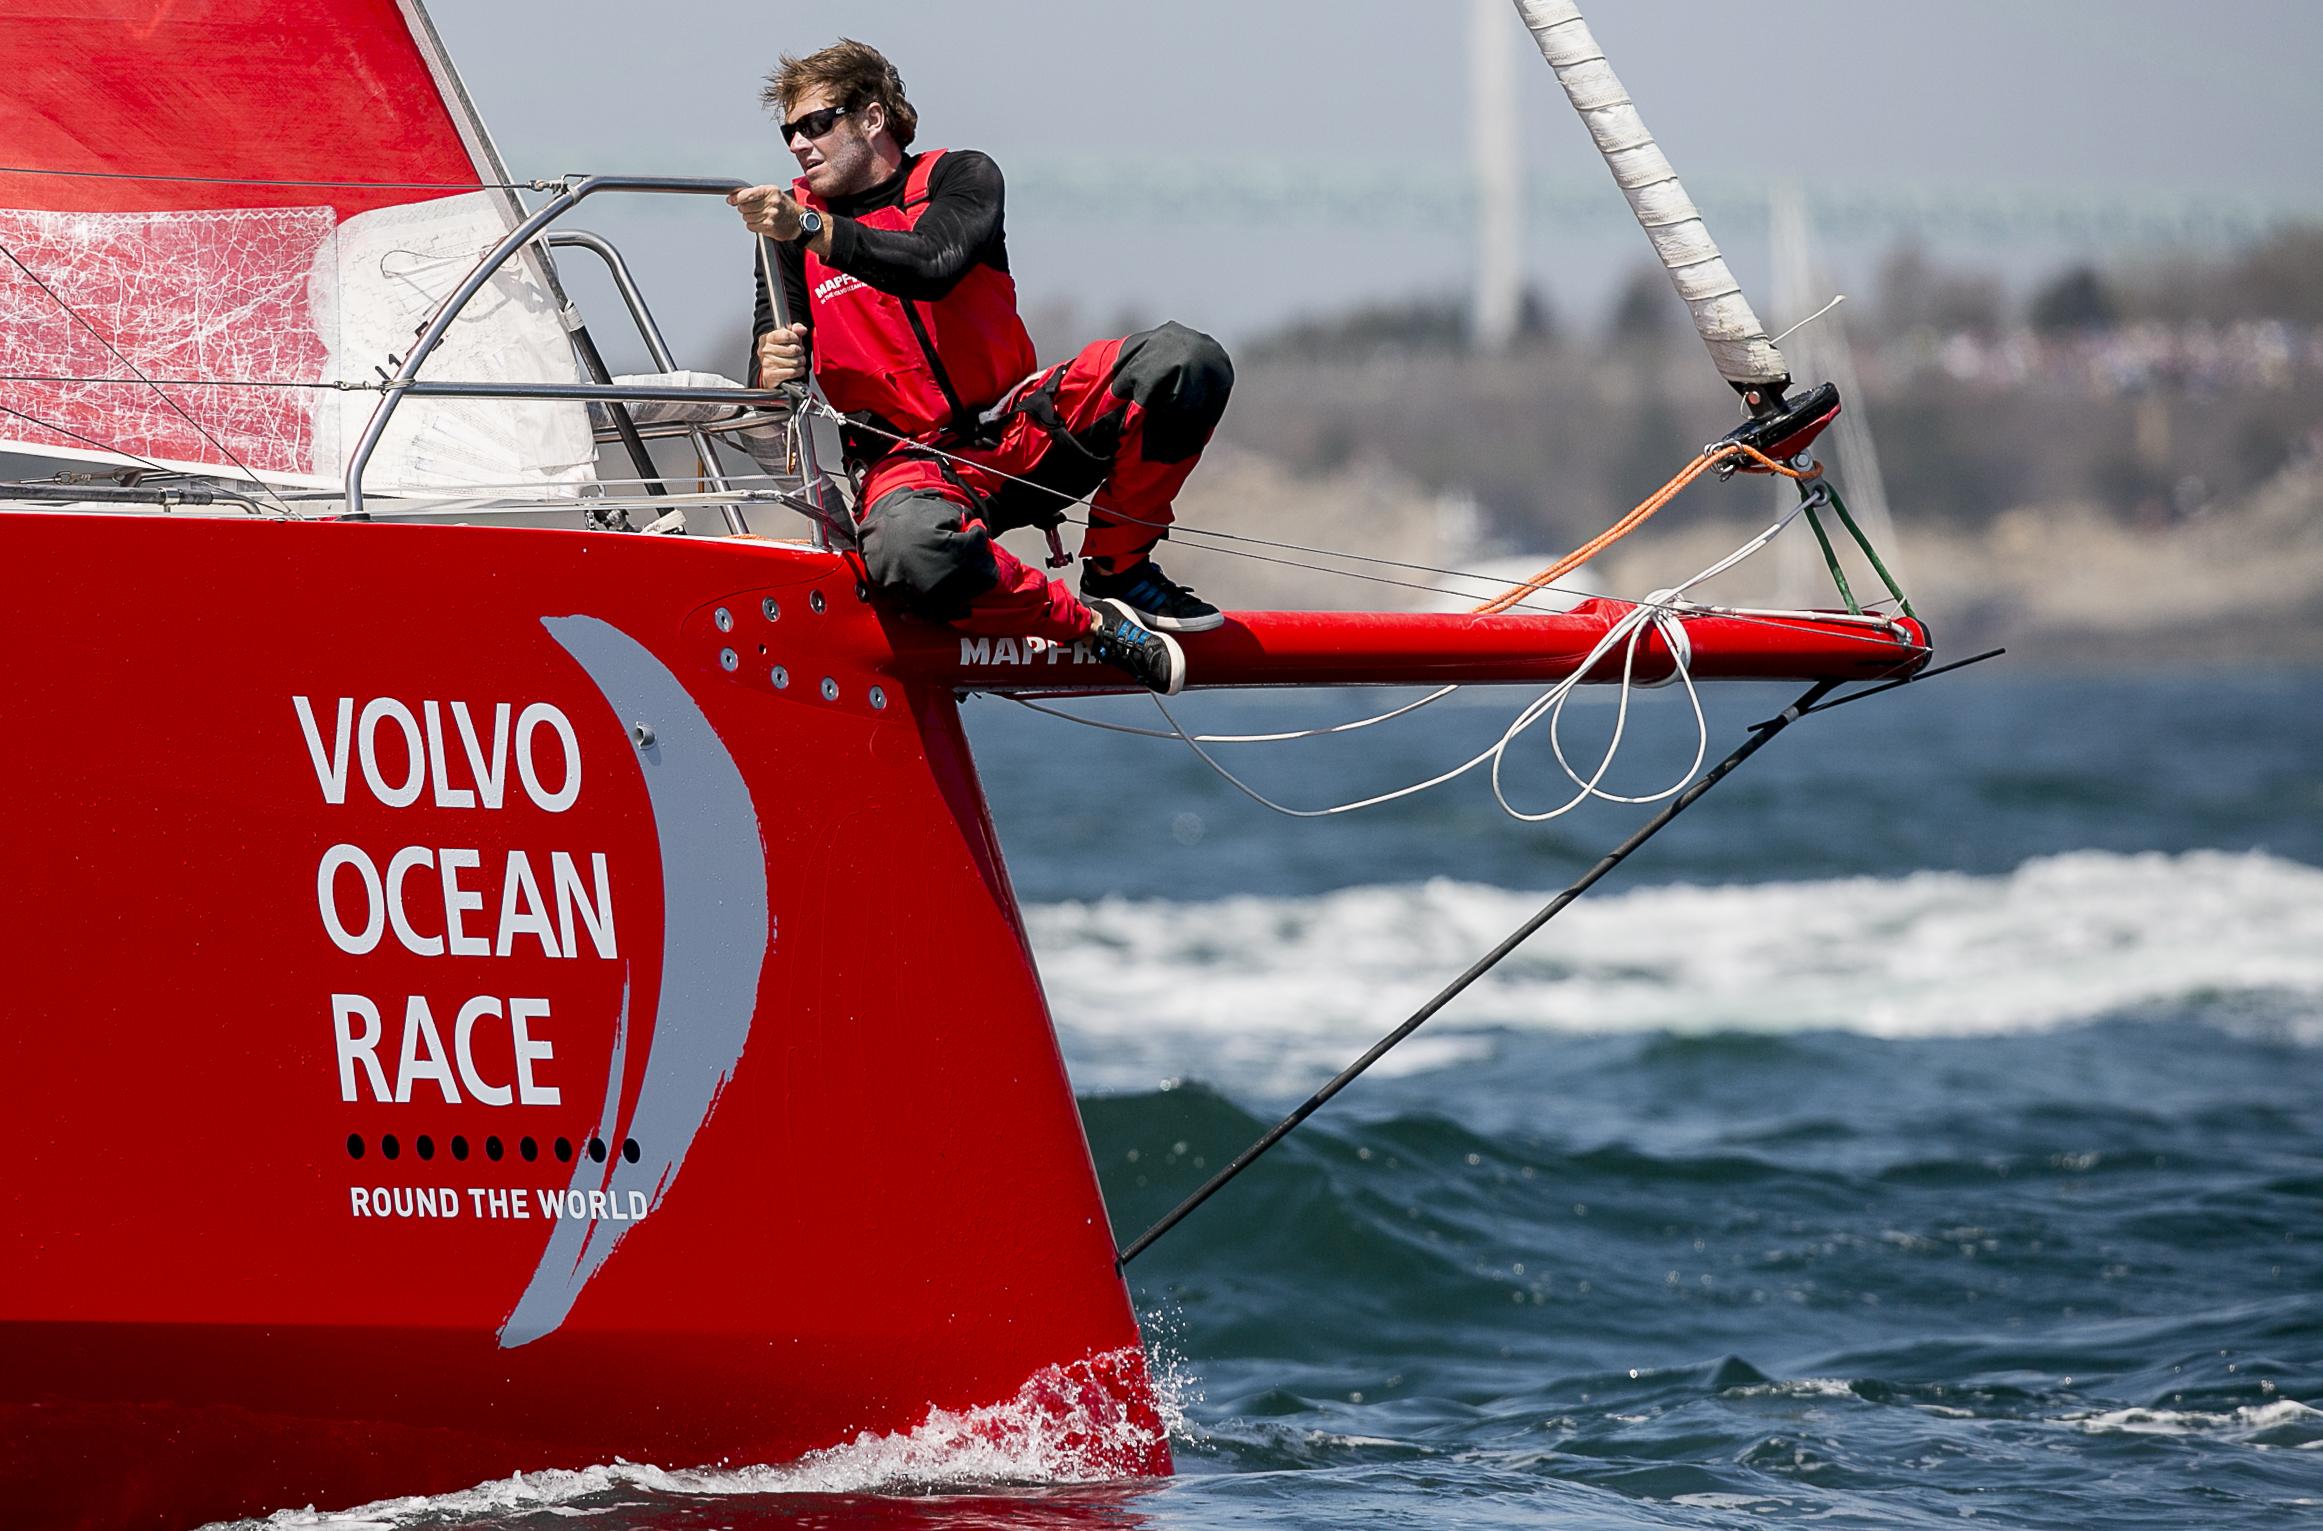 Photos: Volvo Ocean Race Departs Newport. – Billie with an I.E.